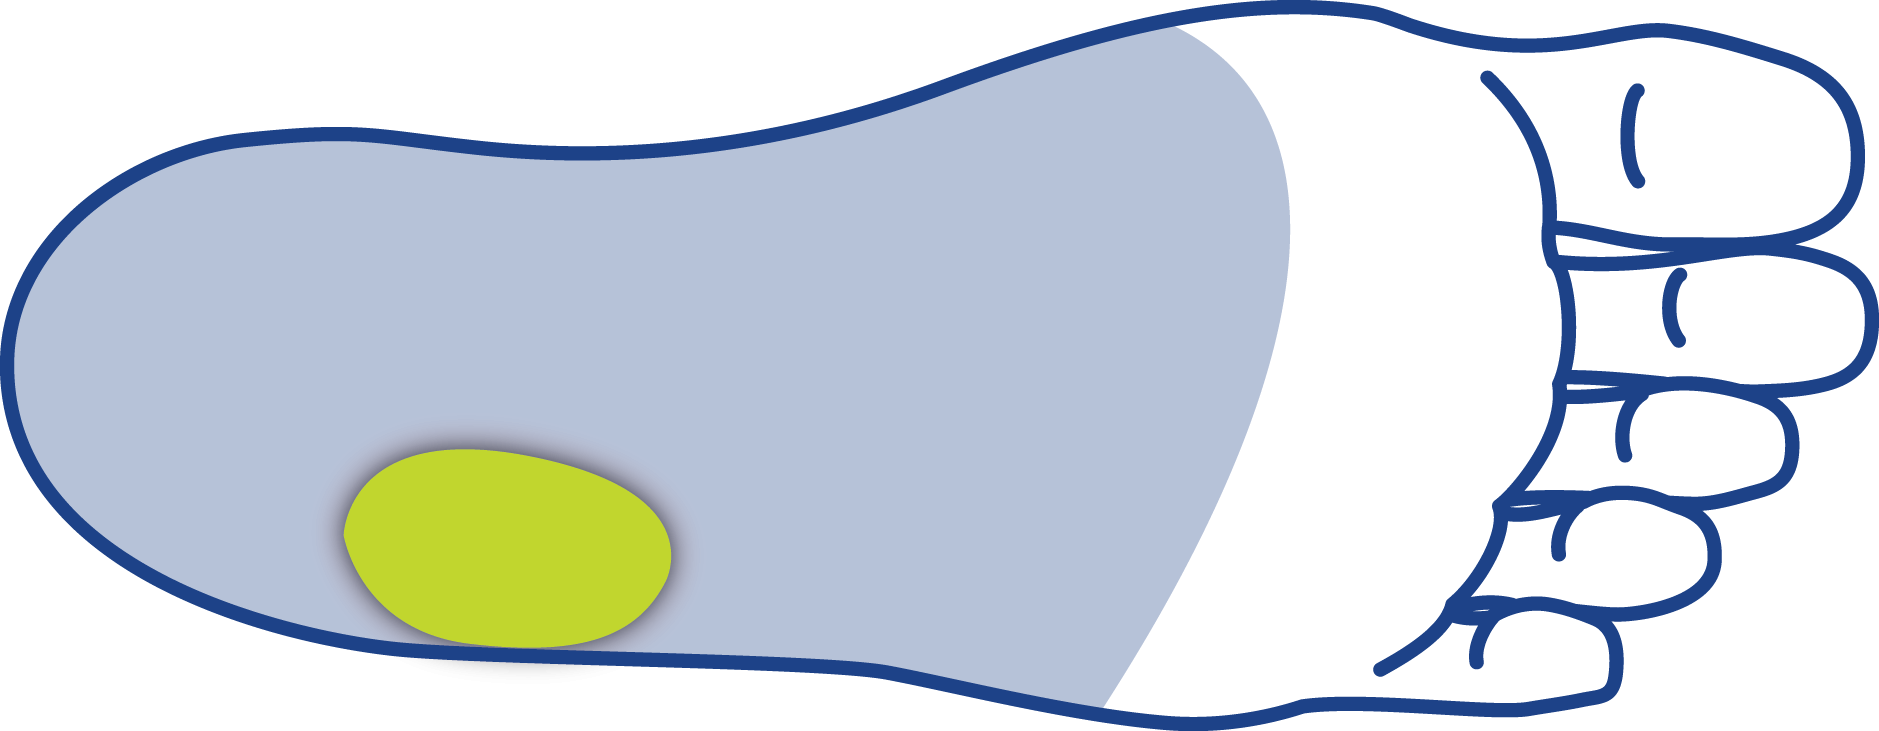 Cuboid Pad